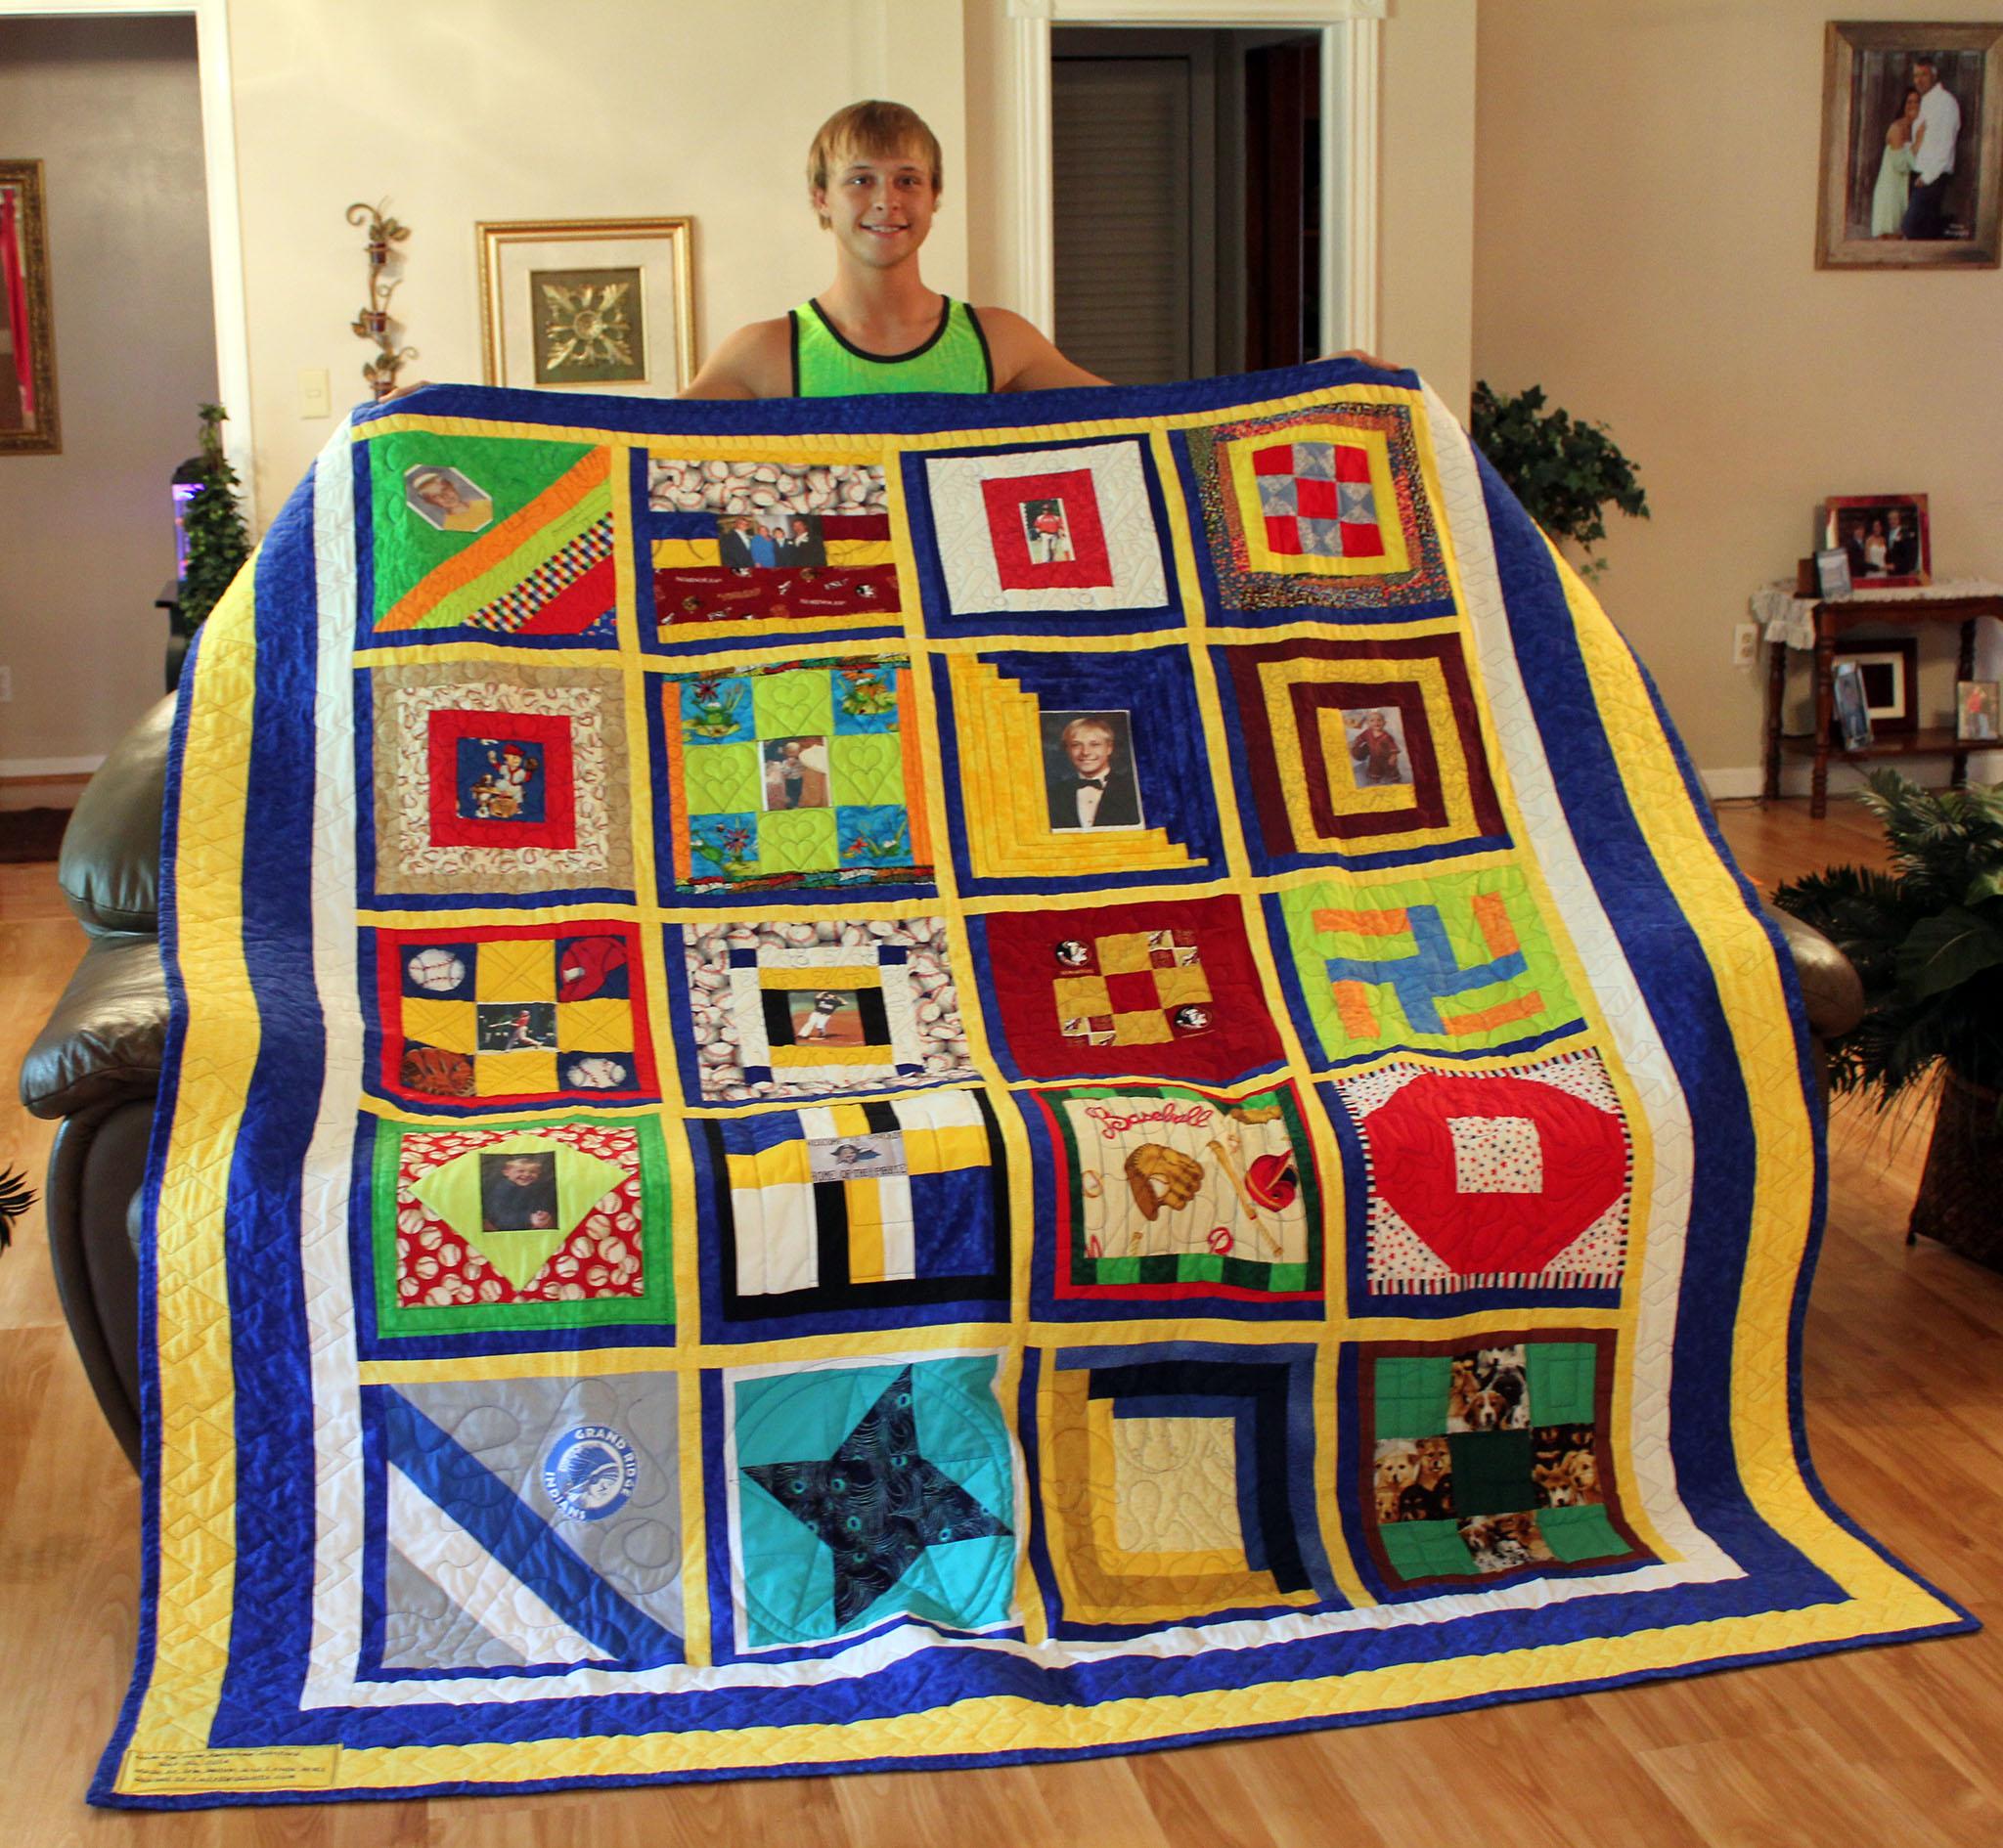 Ryne with quilt